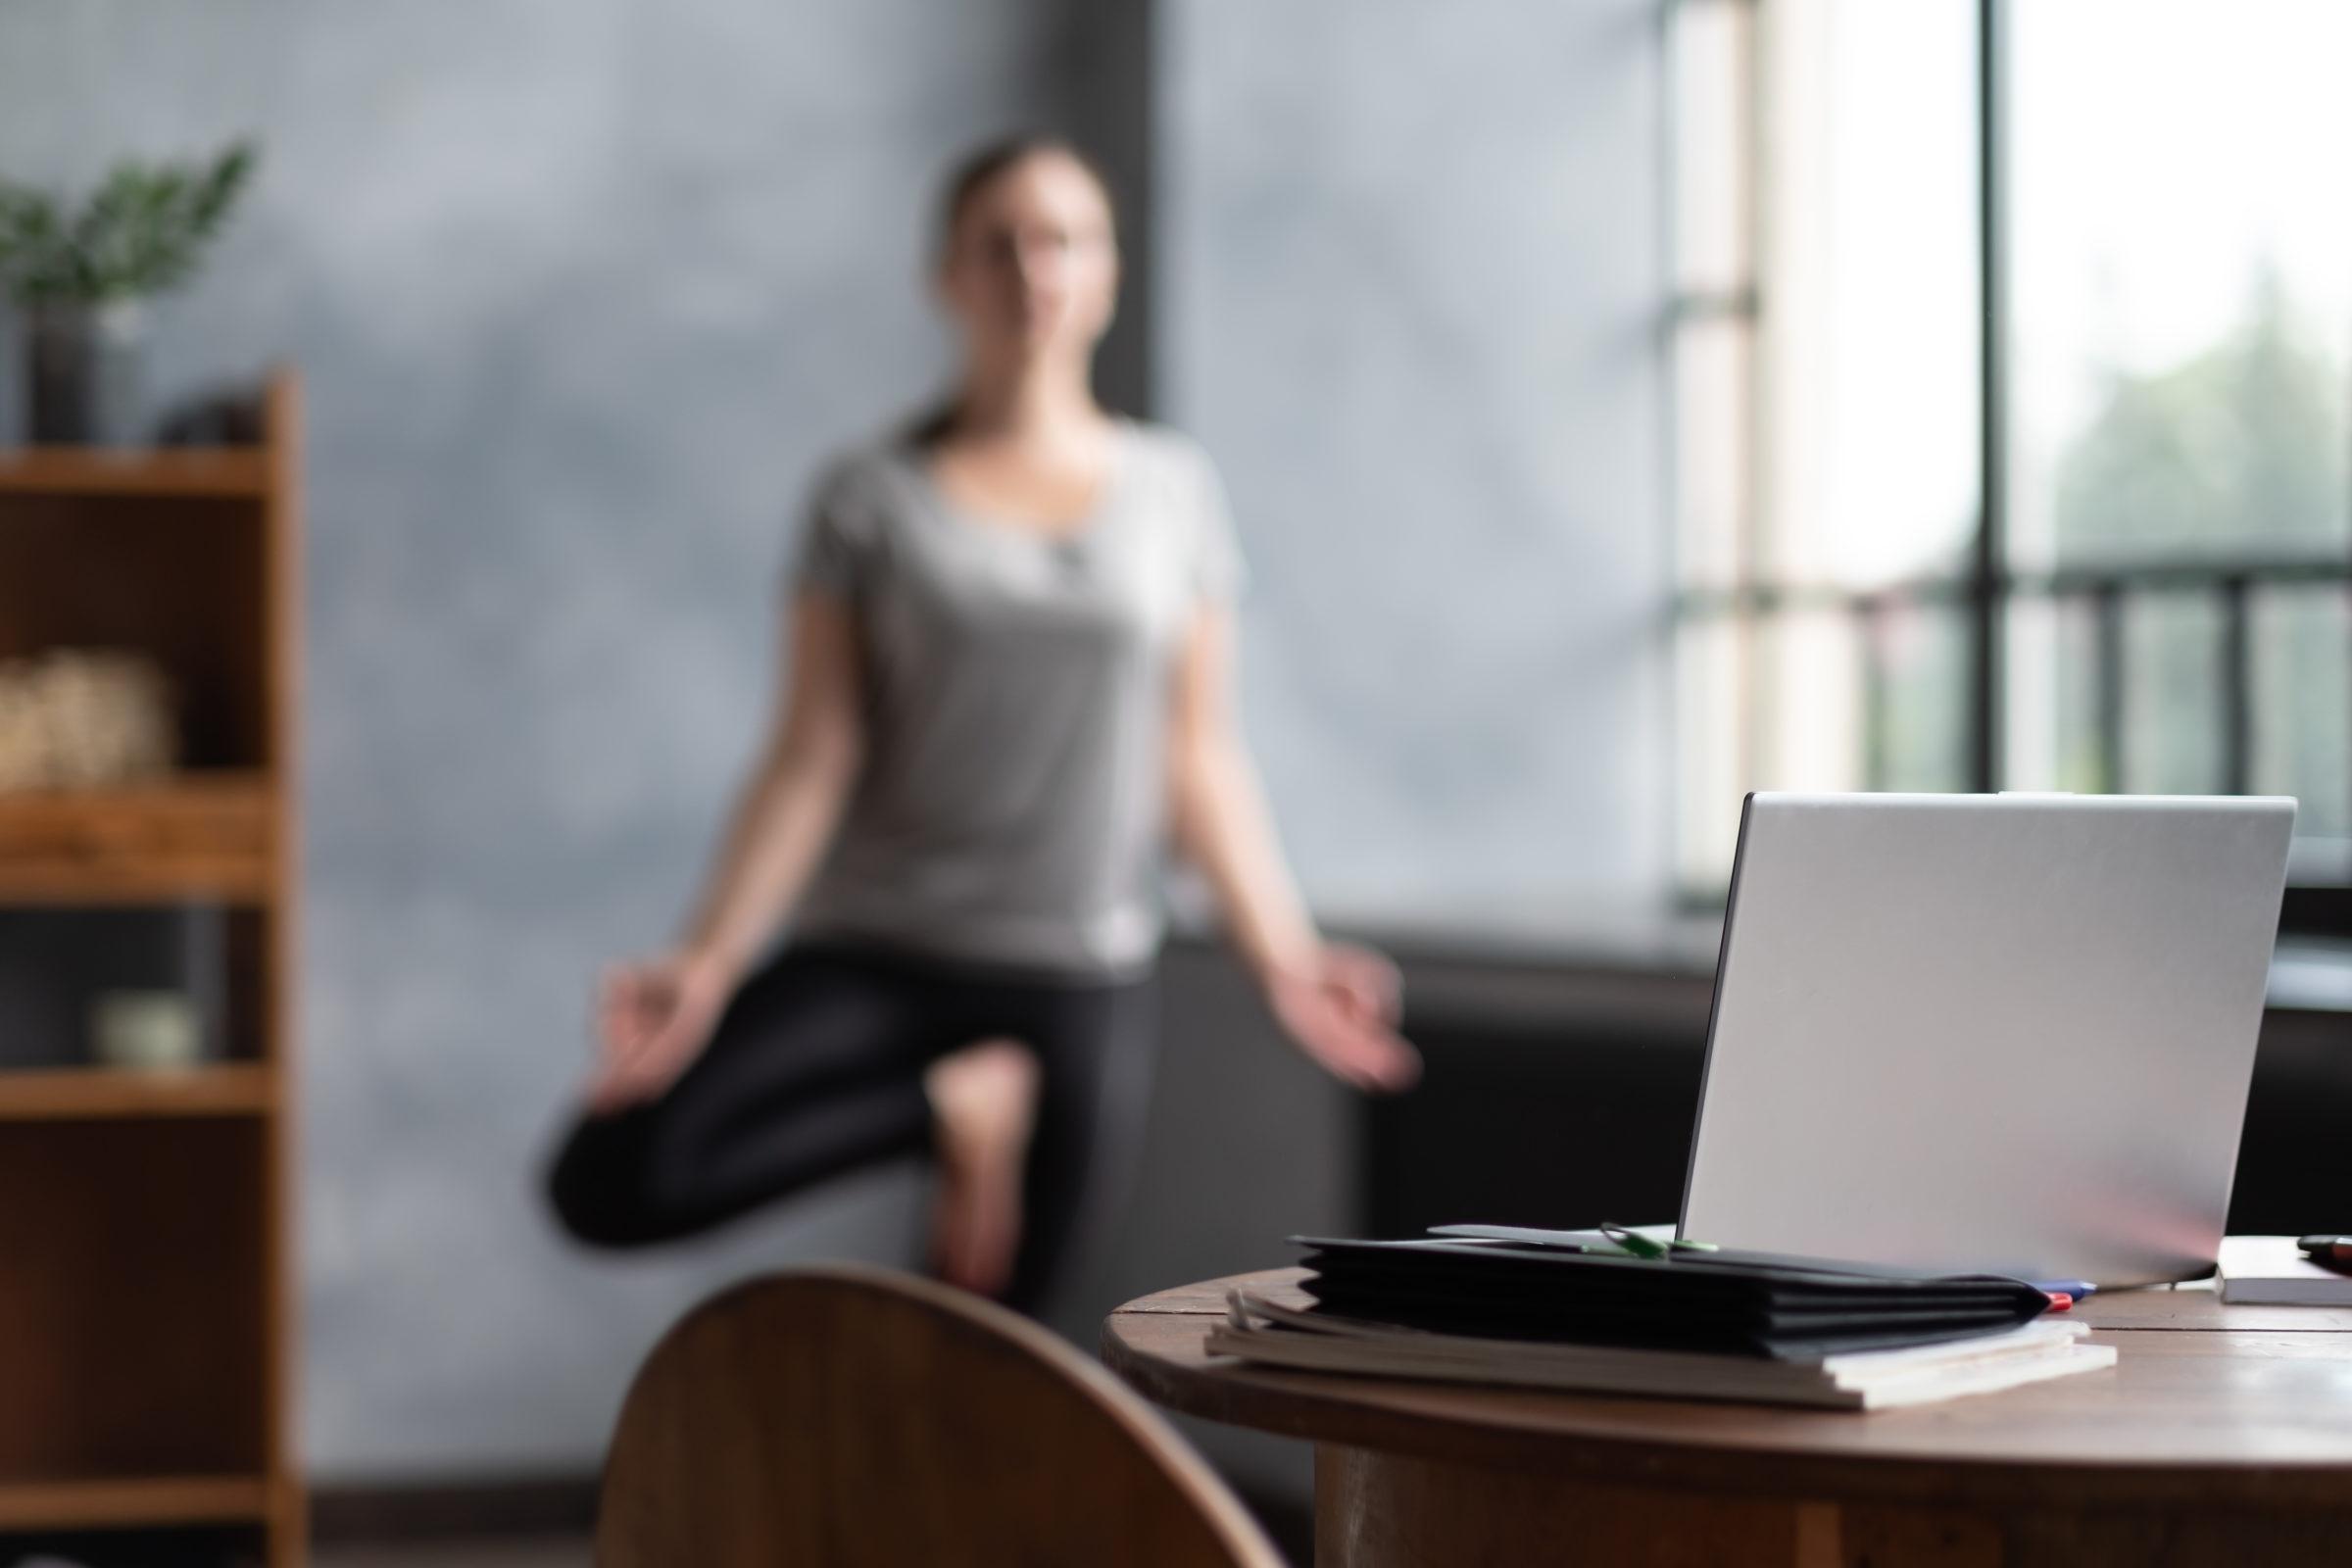 caucasian woman working yoga exercise doing balanc 9RZRT54